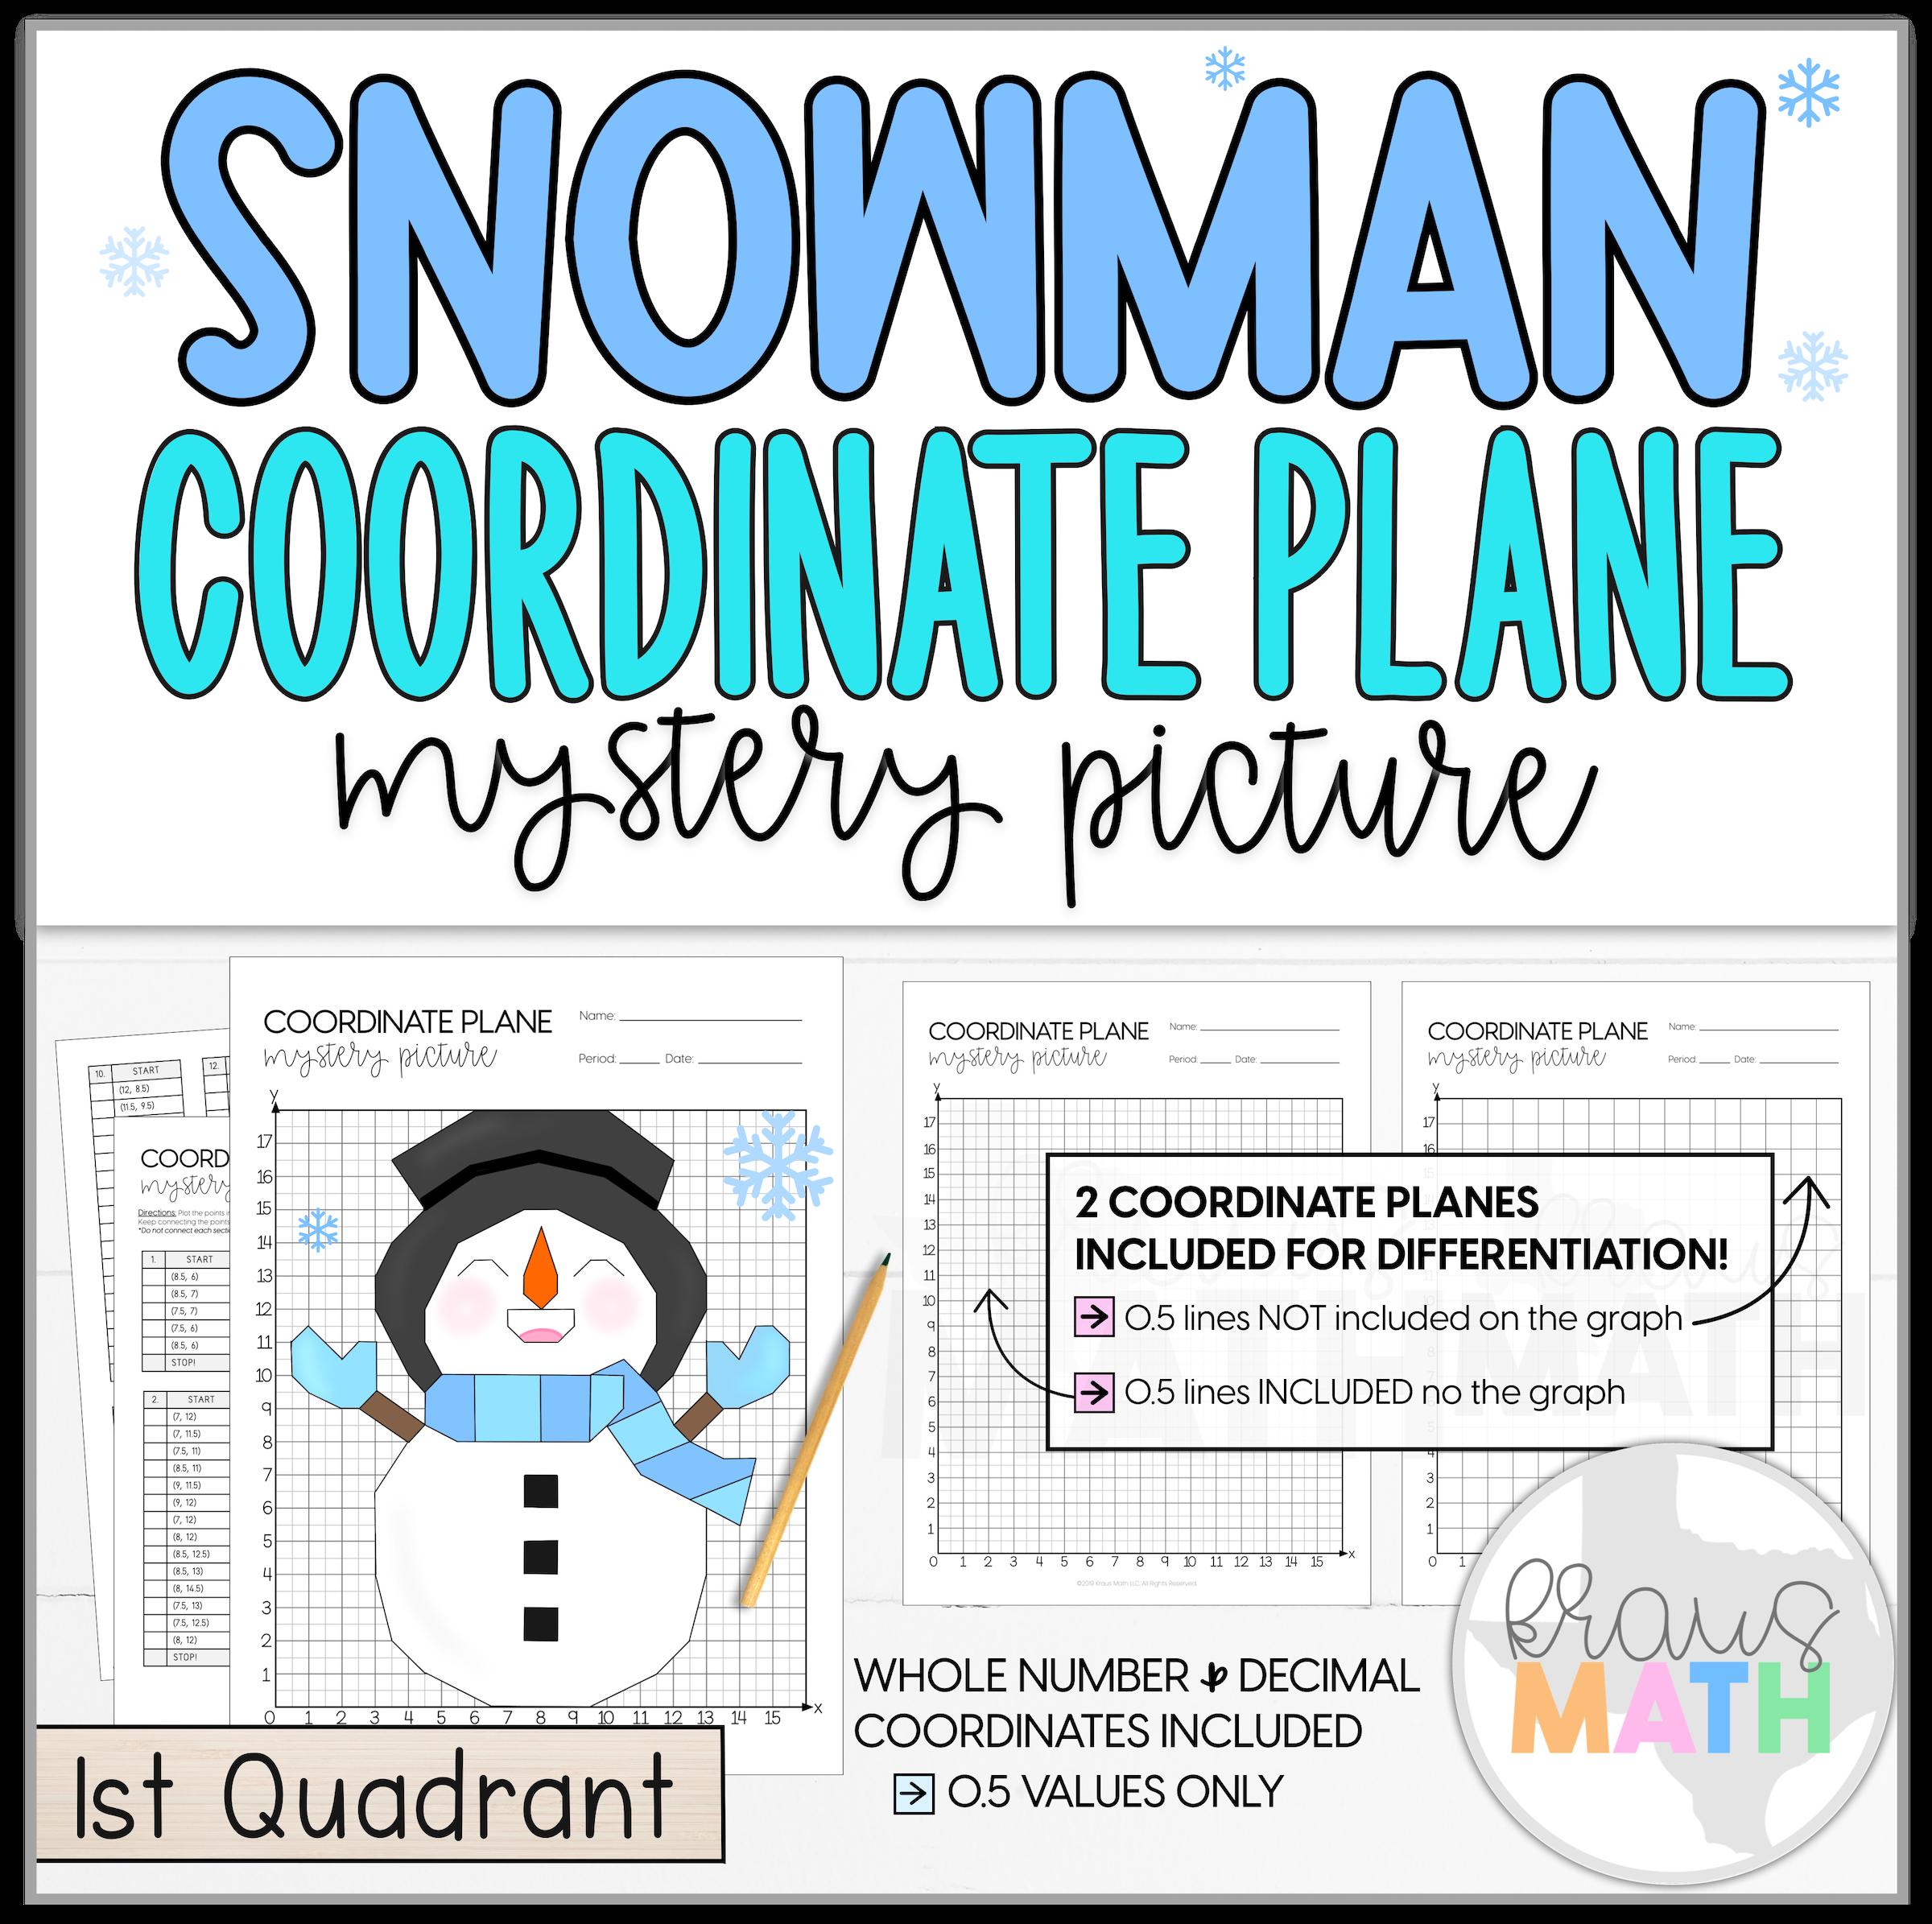 Snowman Let It Snow Coordinate Plane Mystery Picture 1st